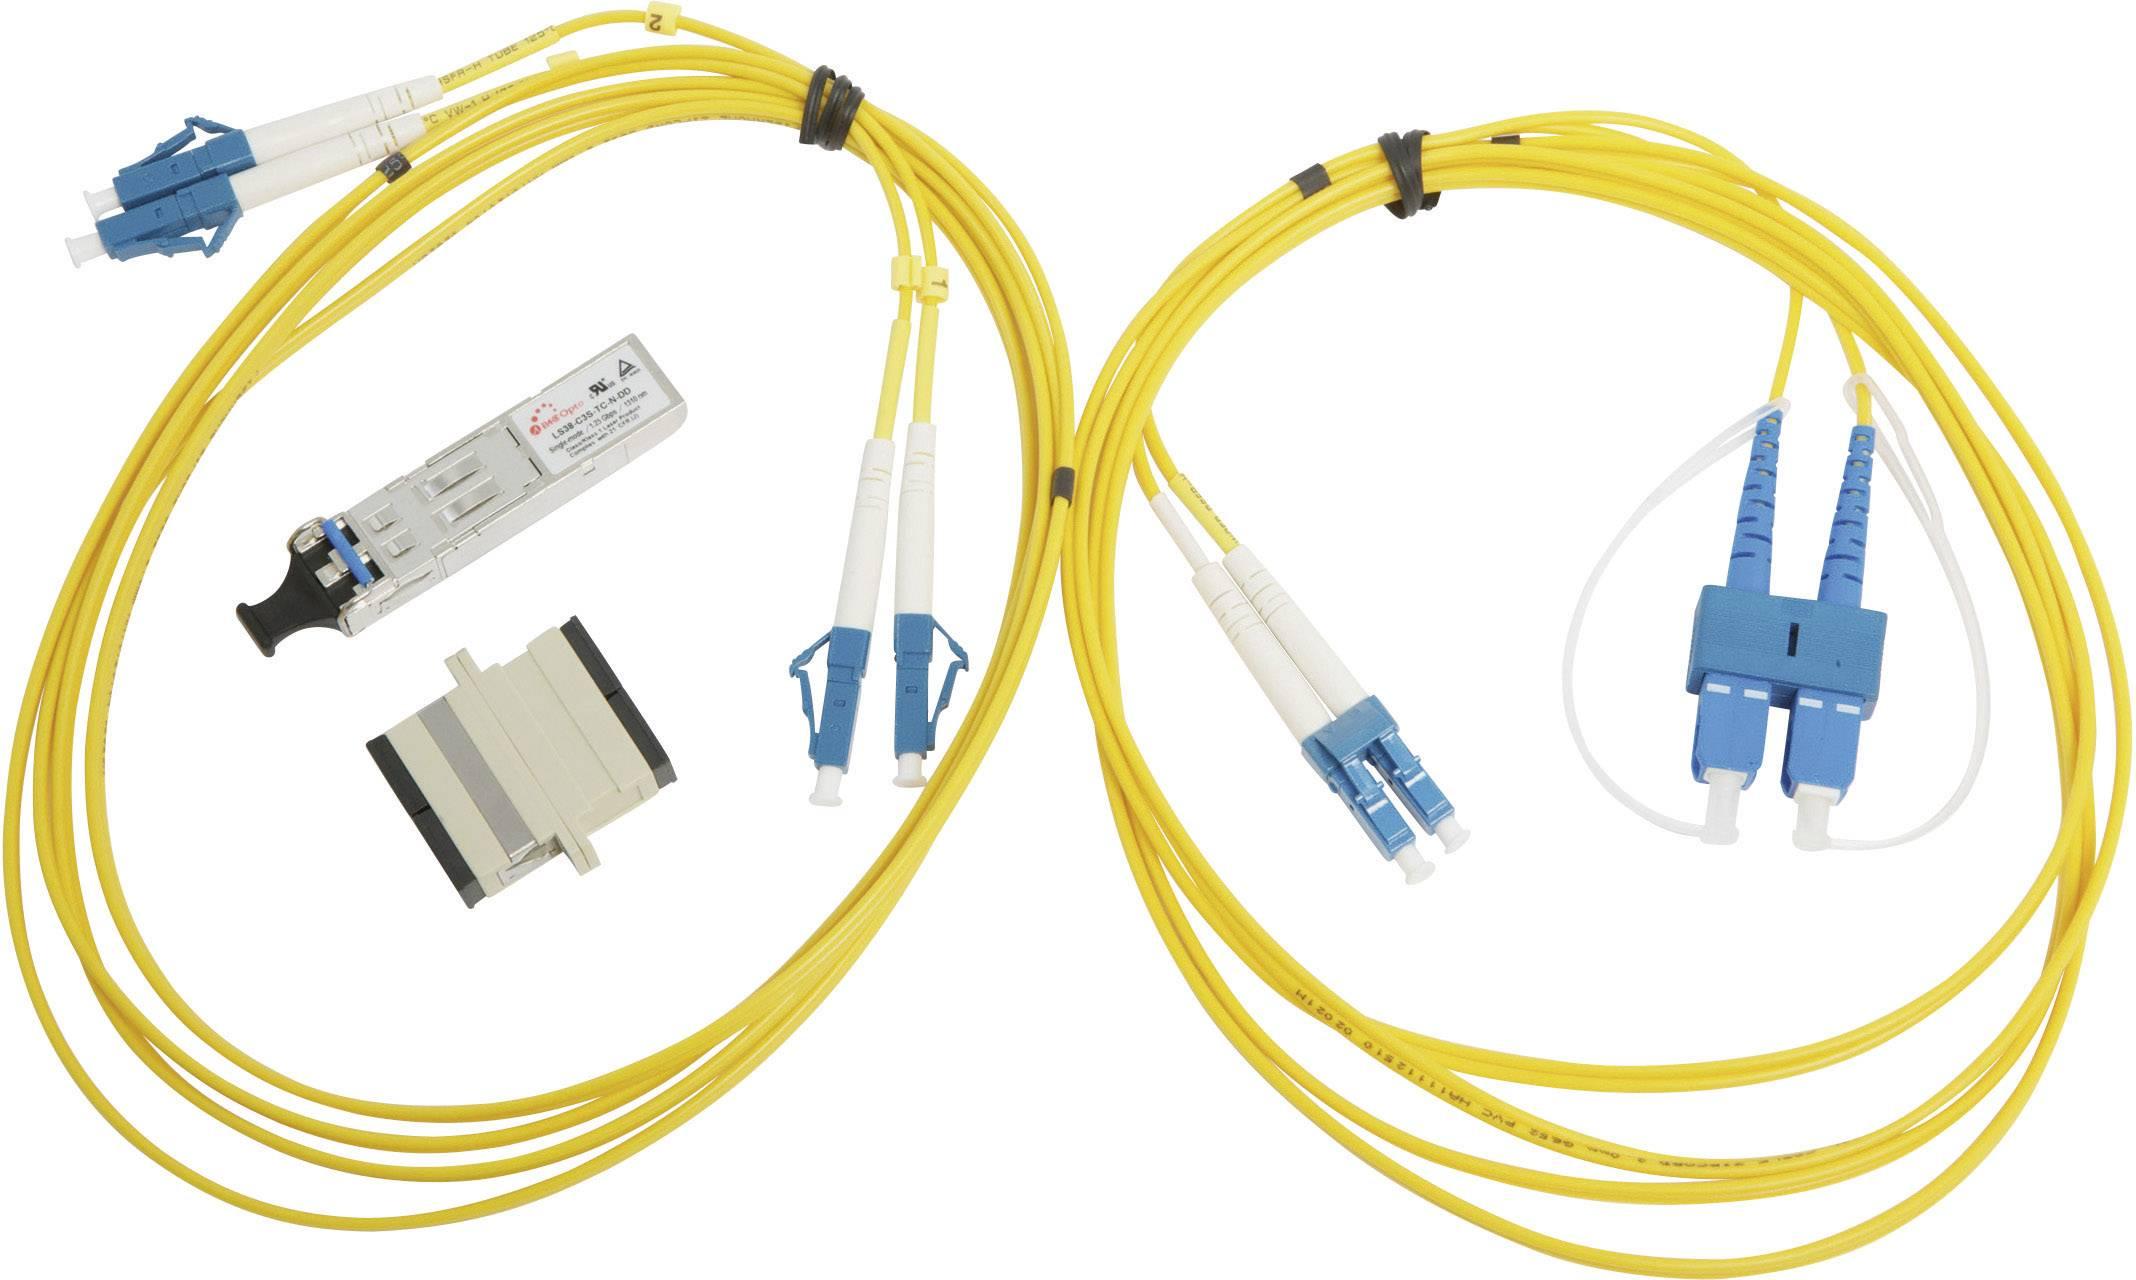 Sada optických vláken 1000BASE-LX IDEAL Networks 1000BASE LWL-LX-Kit